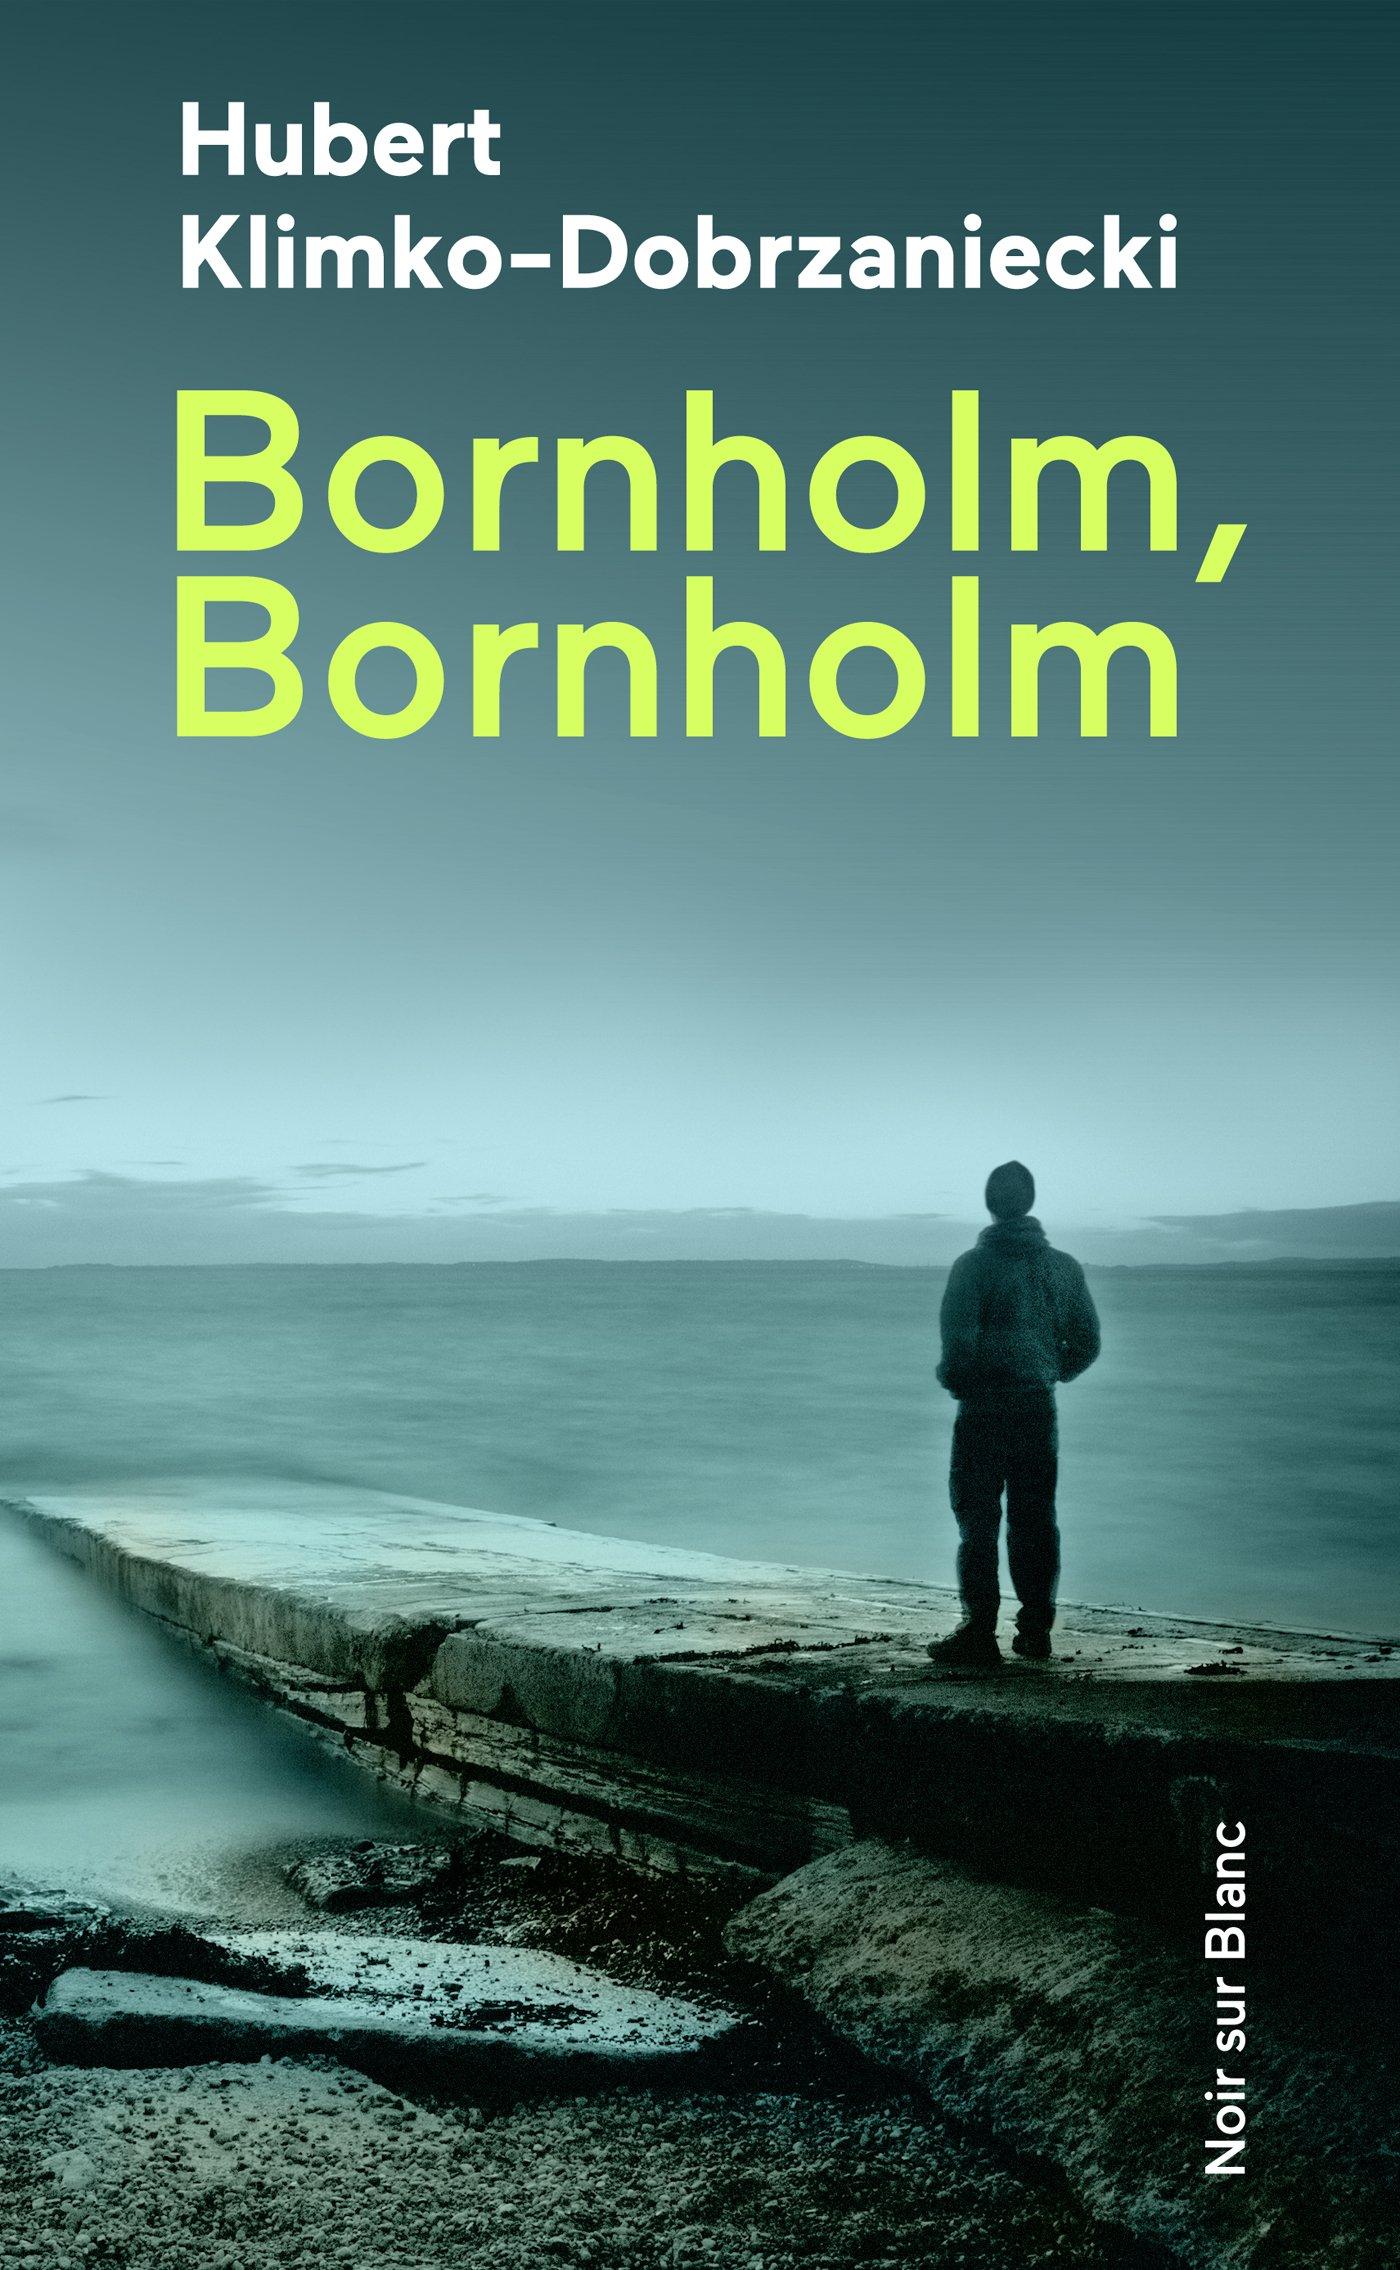 Bornholm, Bornholm - Ebook (Książka EPUB) do pobrania w formacie EPUB